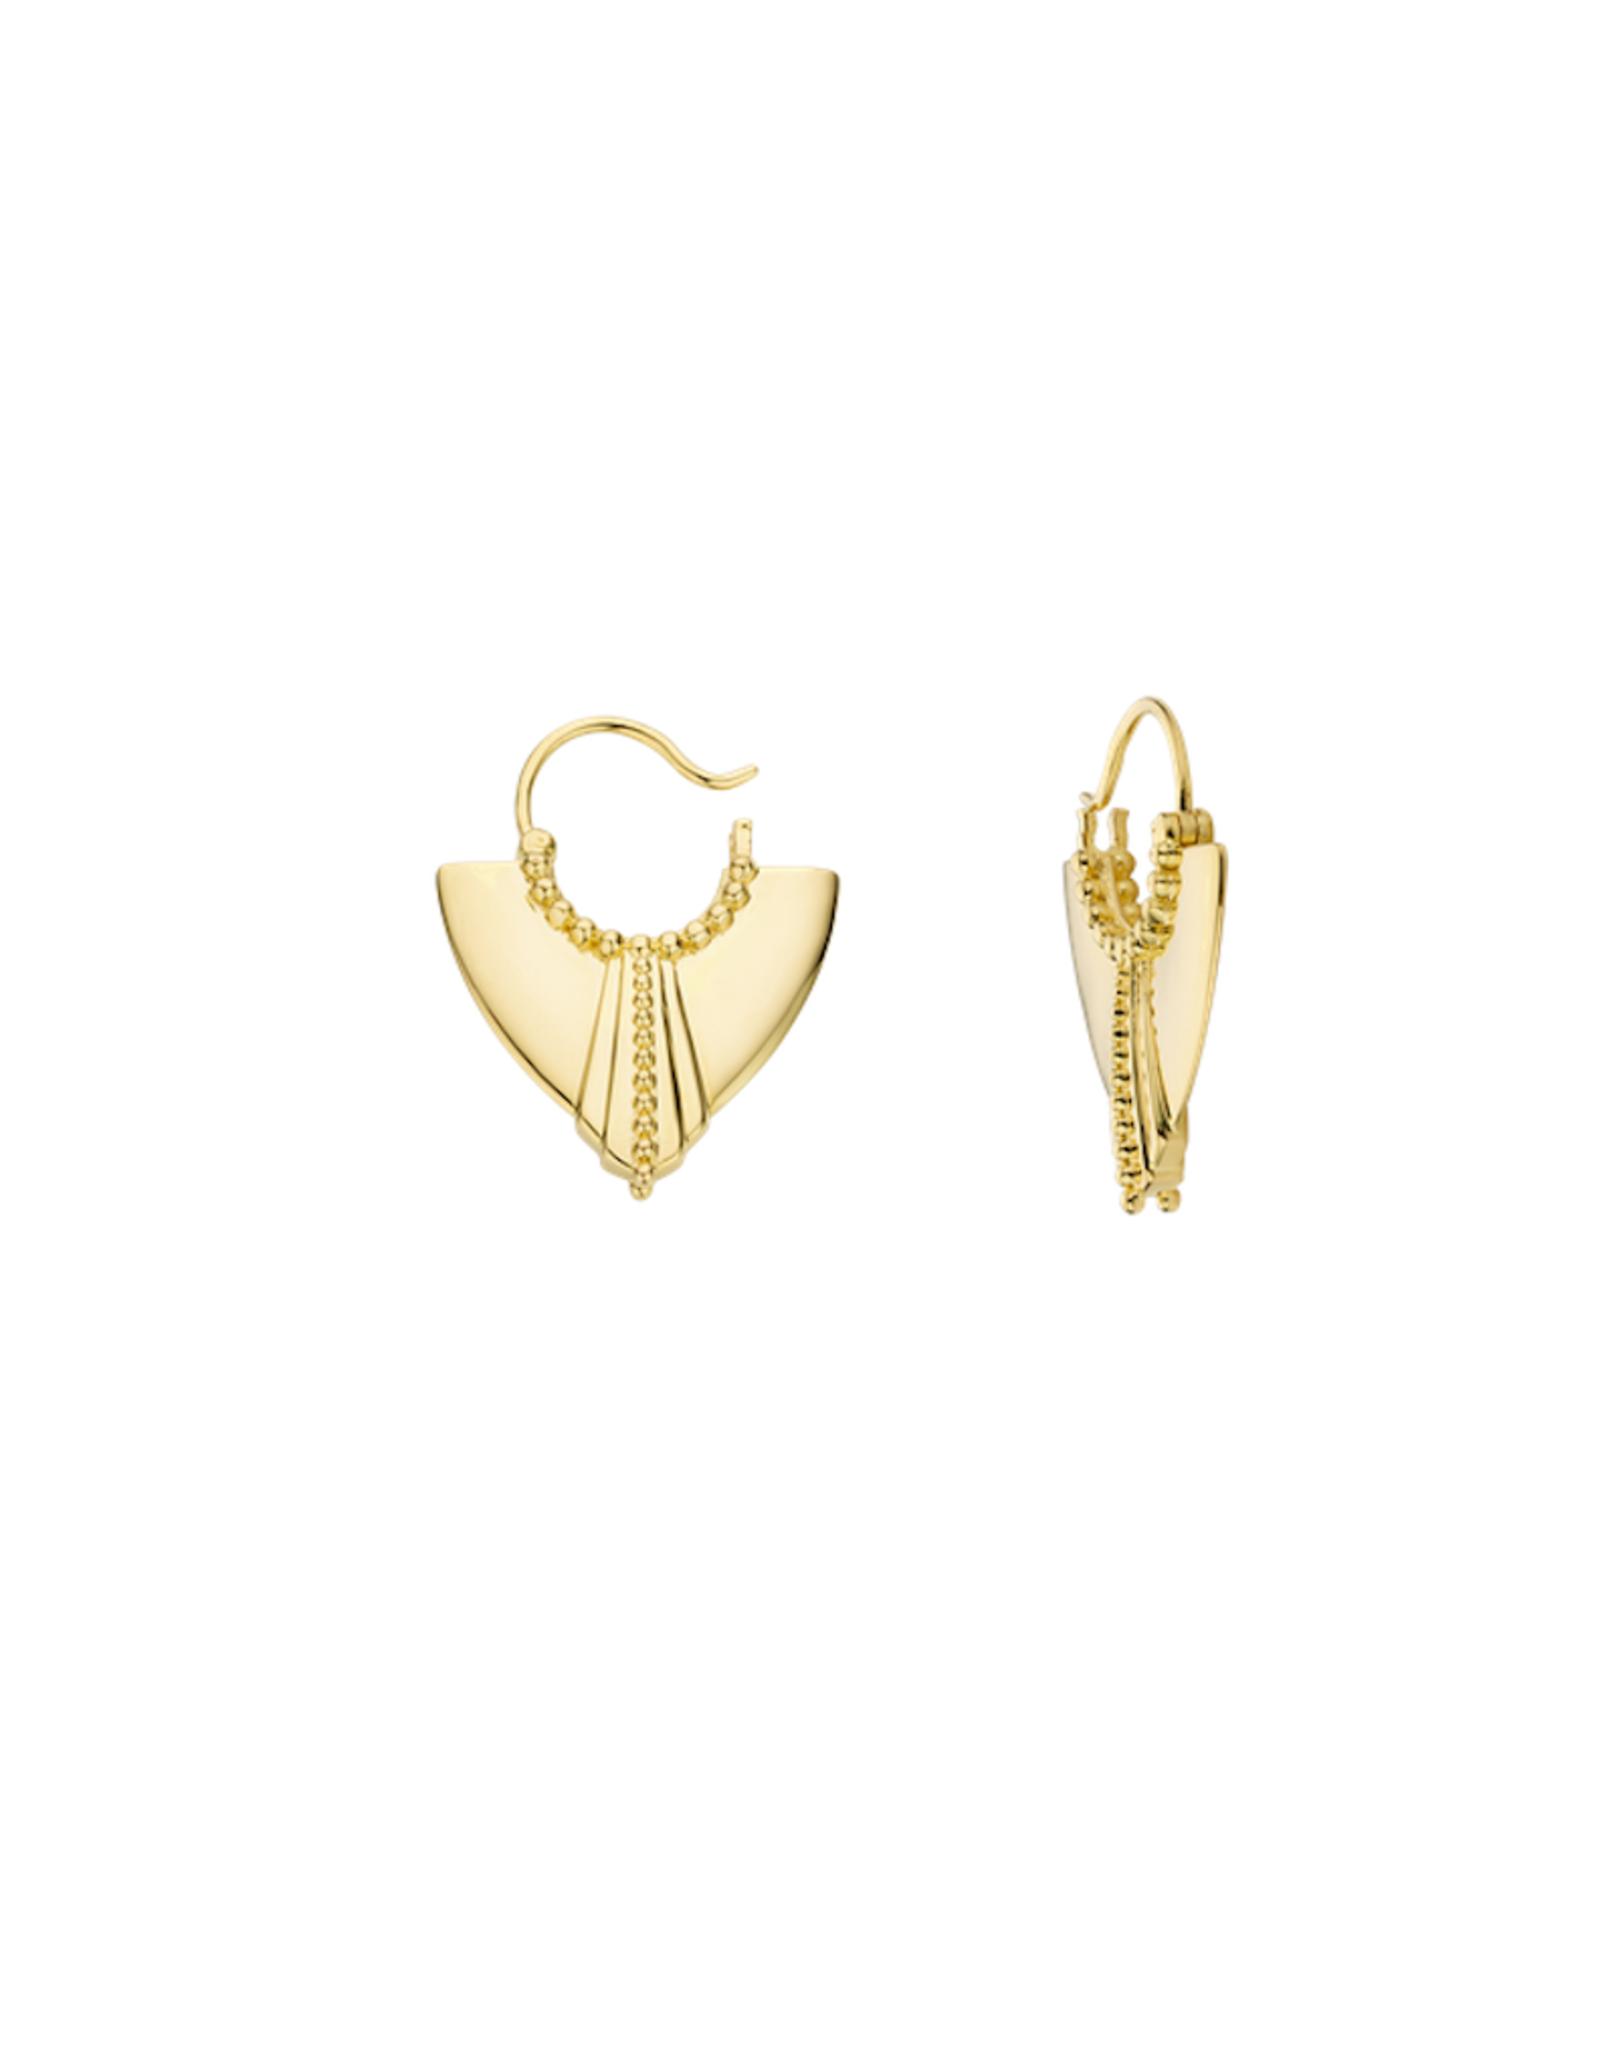 Freida Earrings Gold